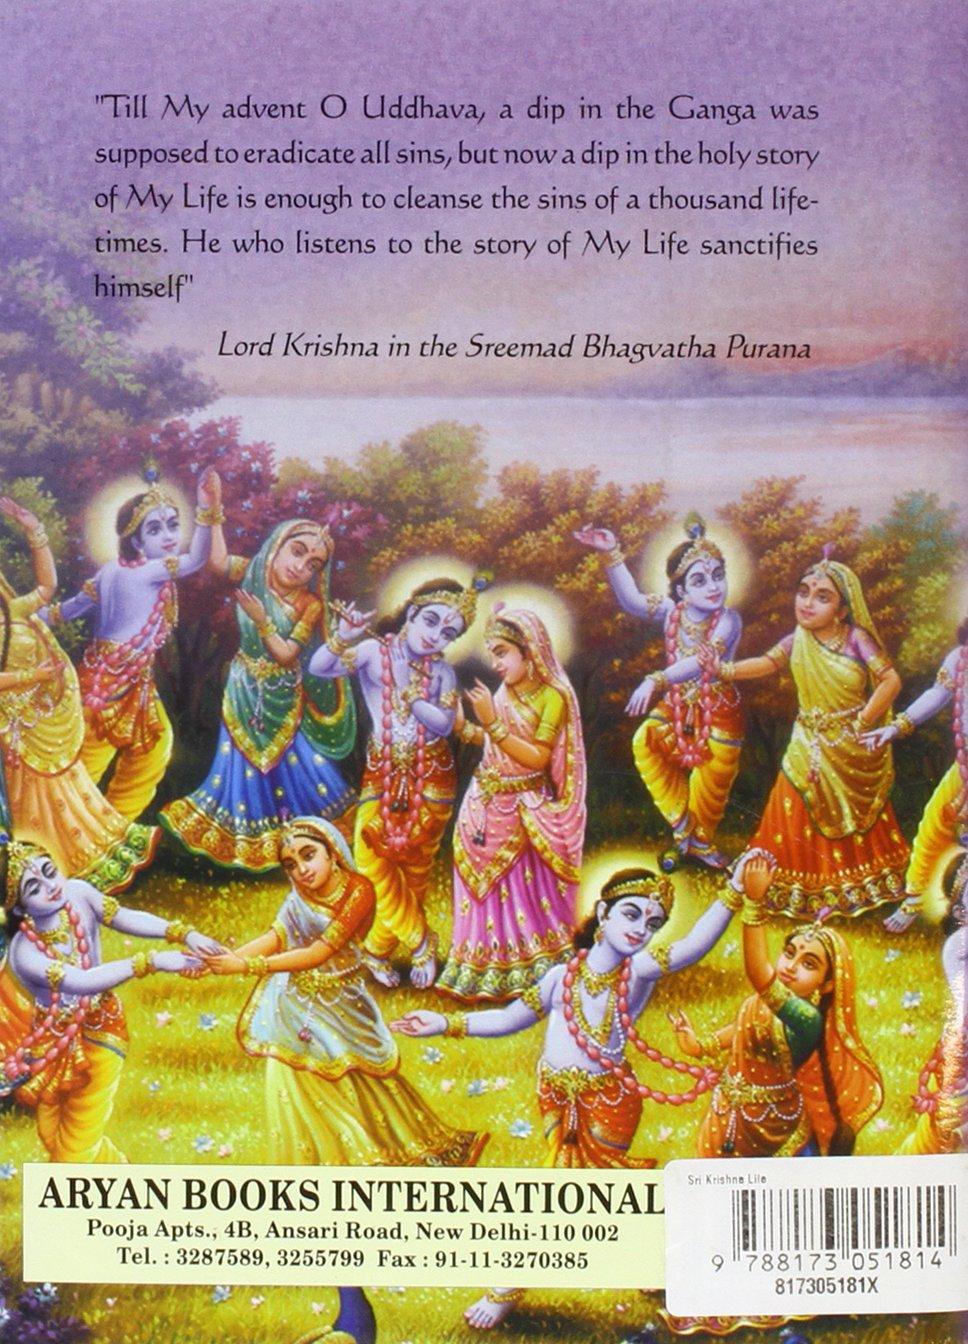 sri krishna lila vanamali 9788173051814 amazon com books